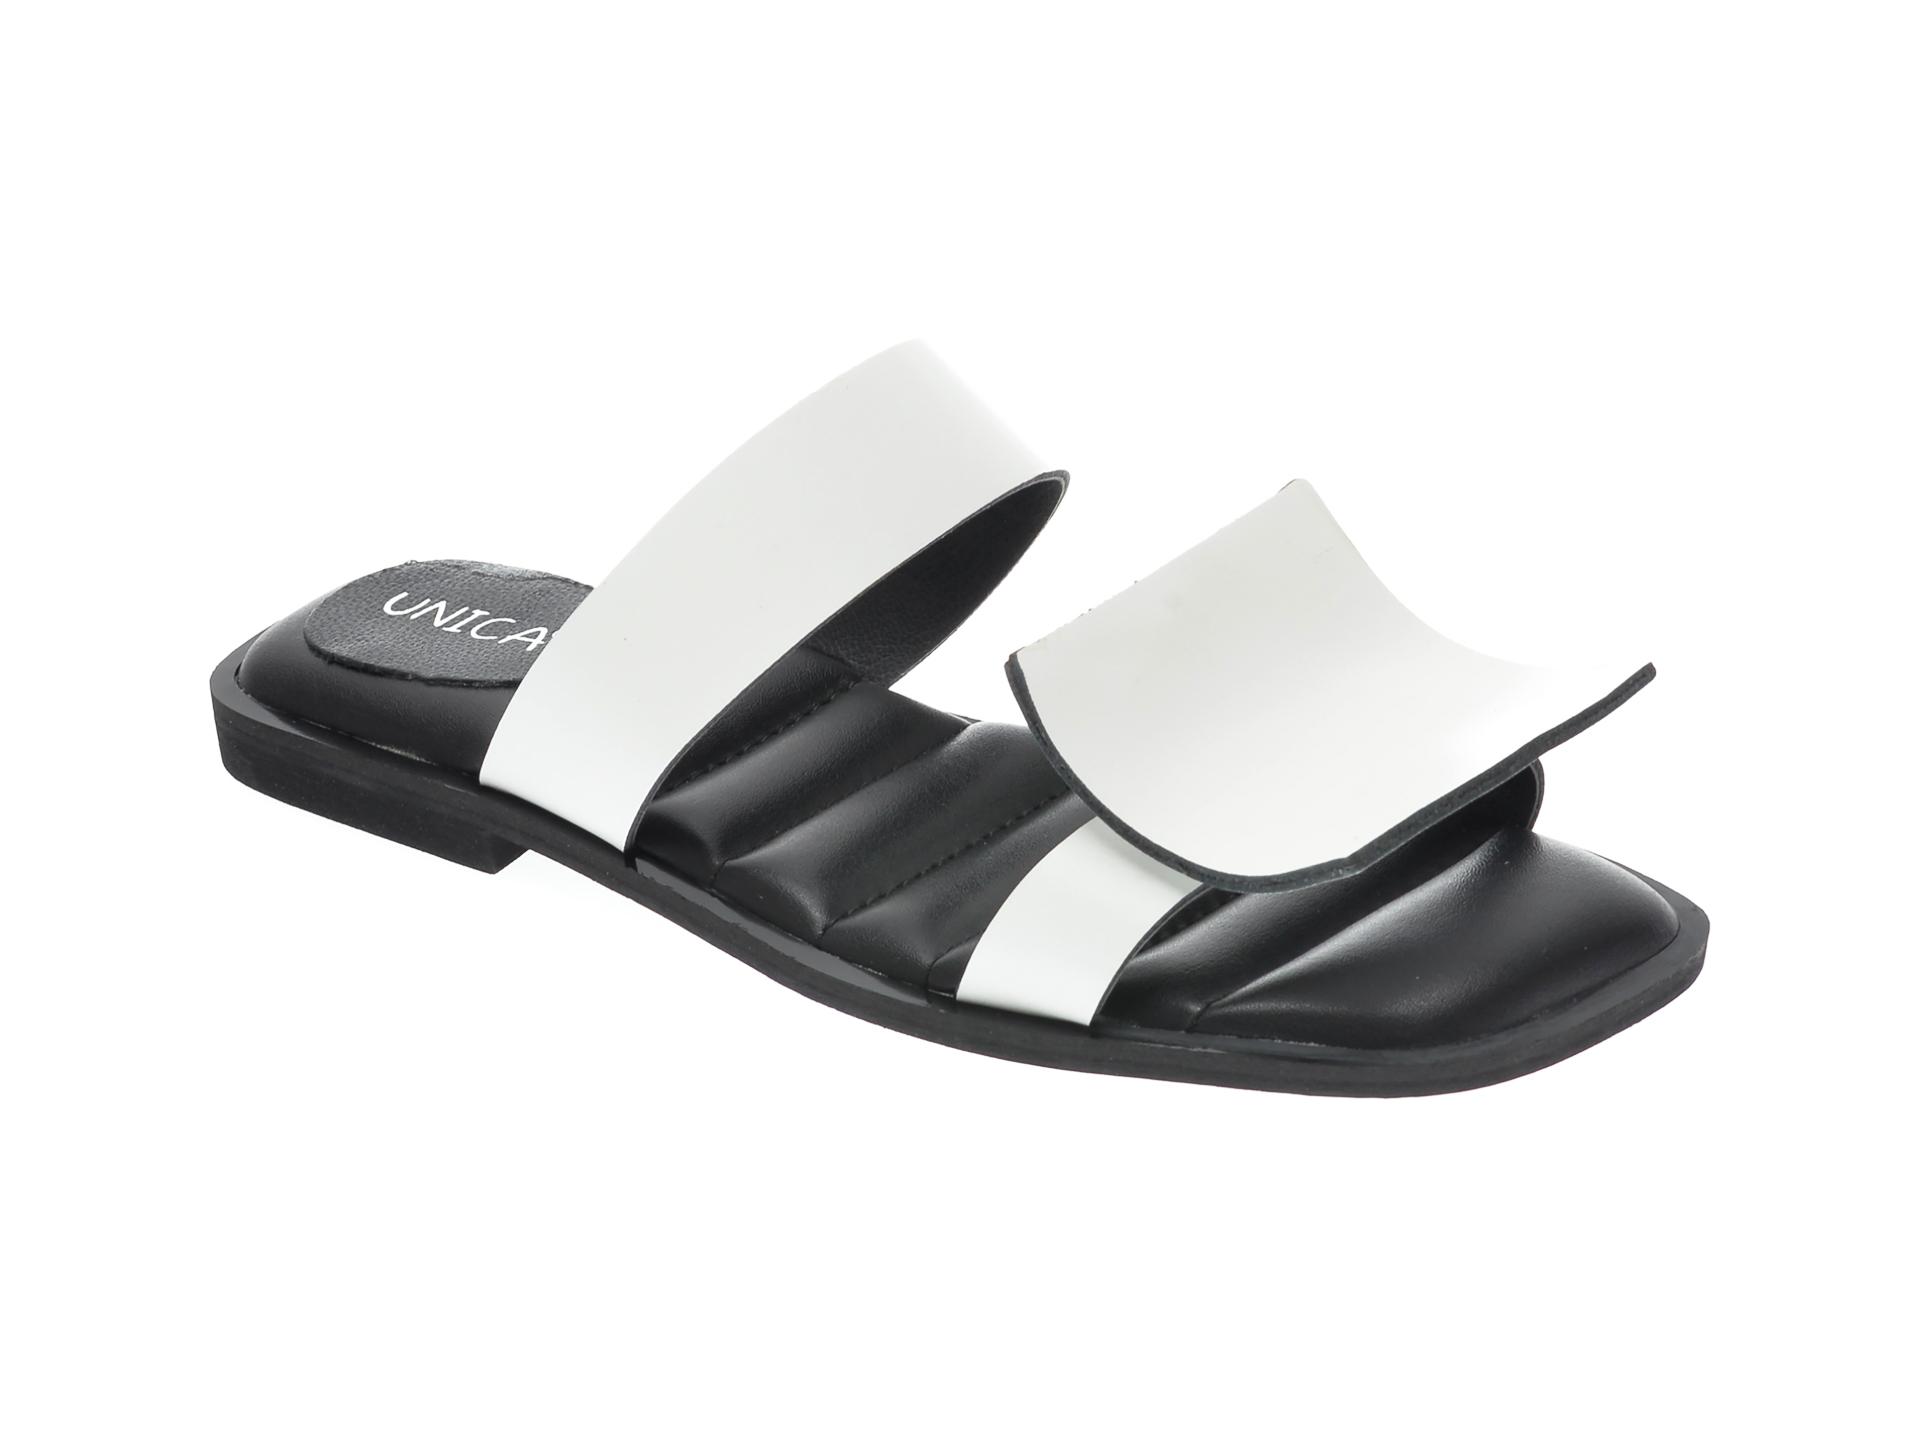 Papuci UNICA albi, A6418, din piele naturala imagine otter.ro